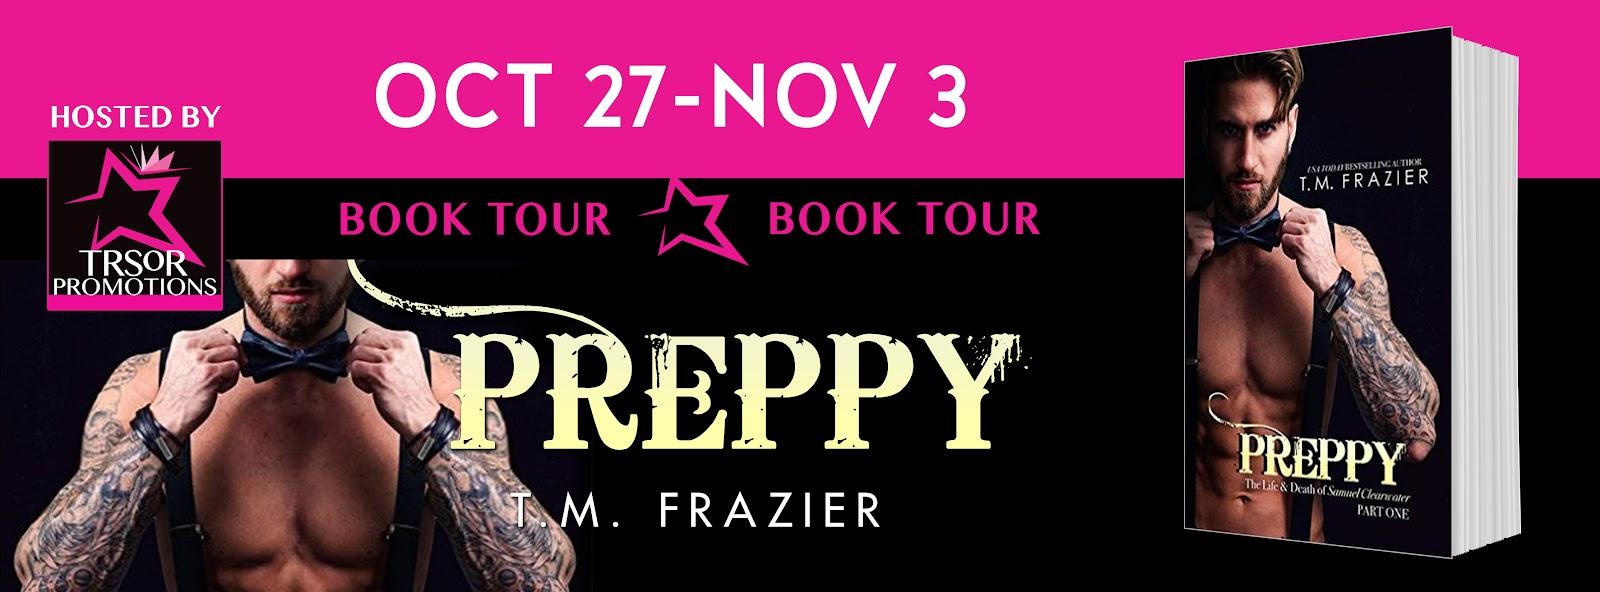 PREPPY_BOOK_TOUR.jpg